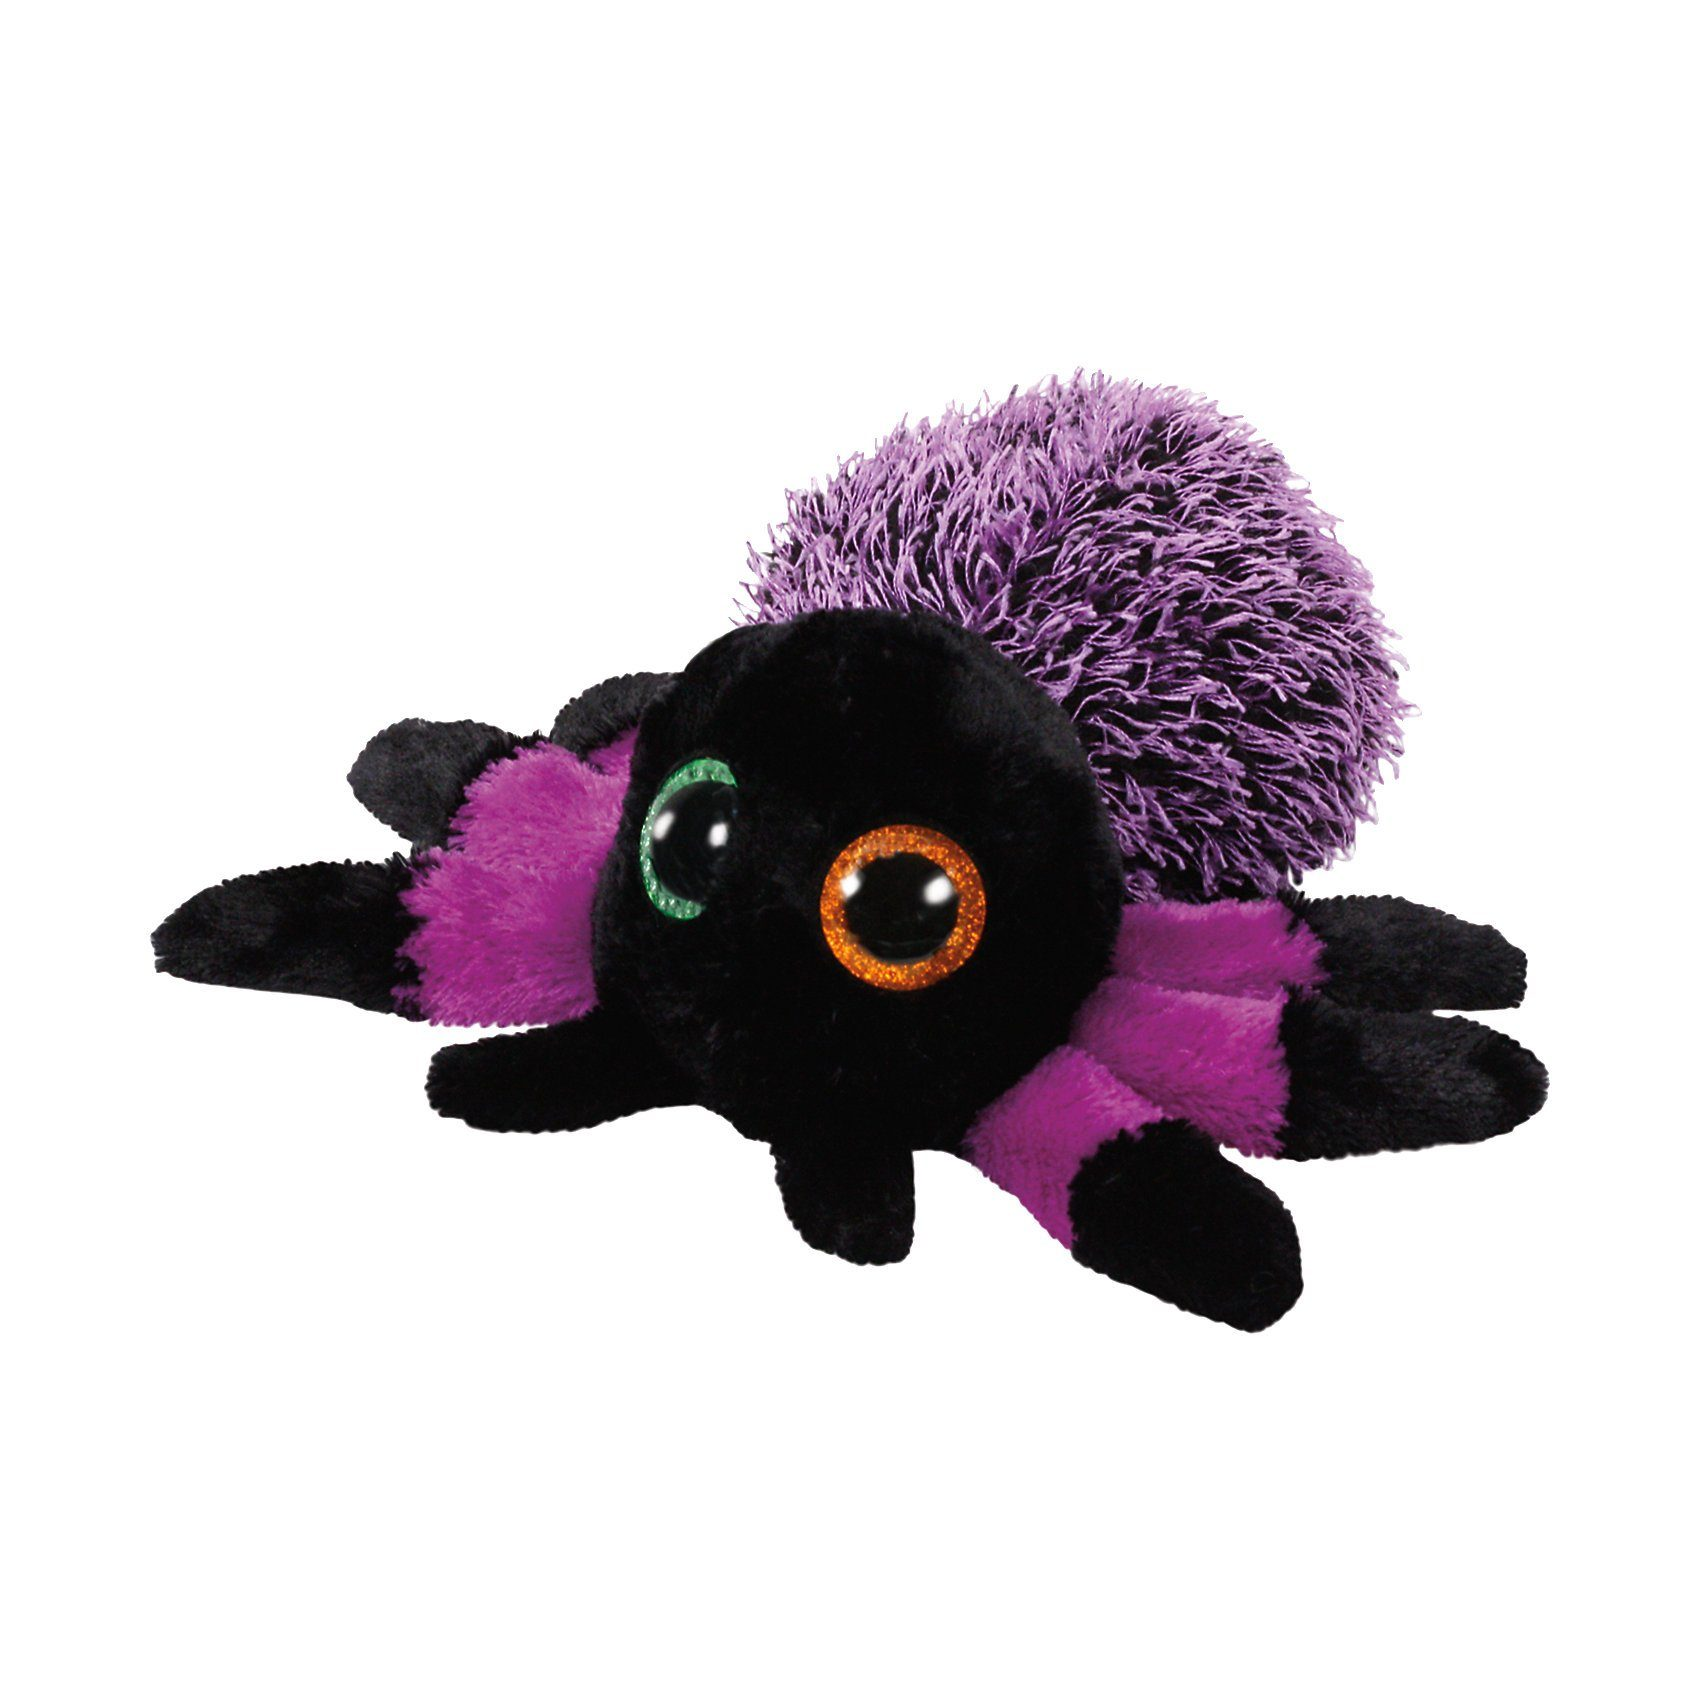 Ty® Beanie Boo Spinne Creeper schwarz/violett, 15 cm